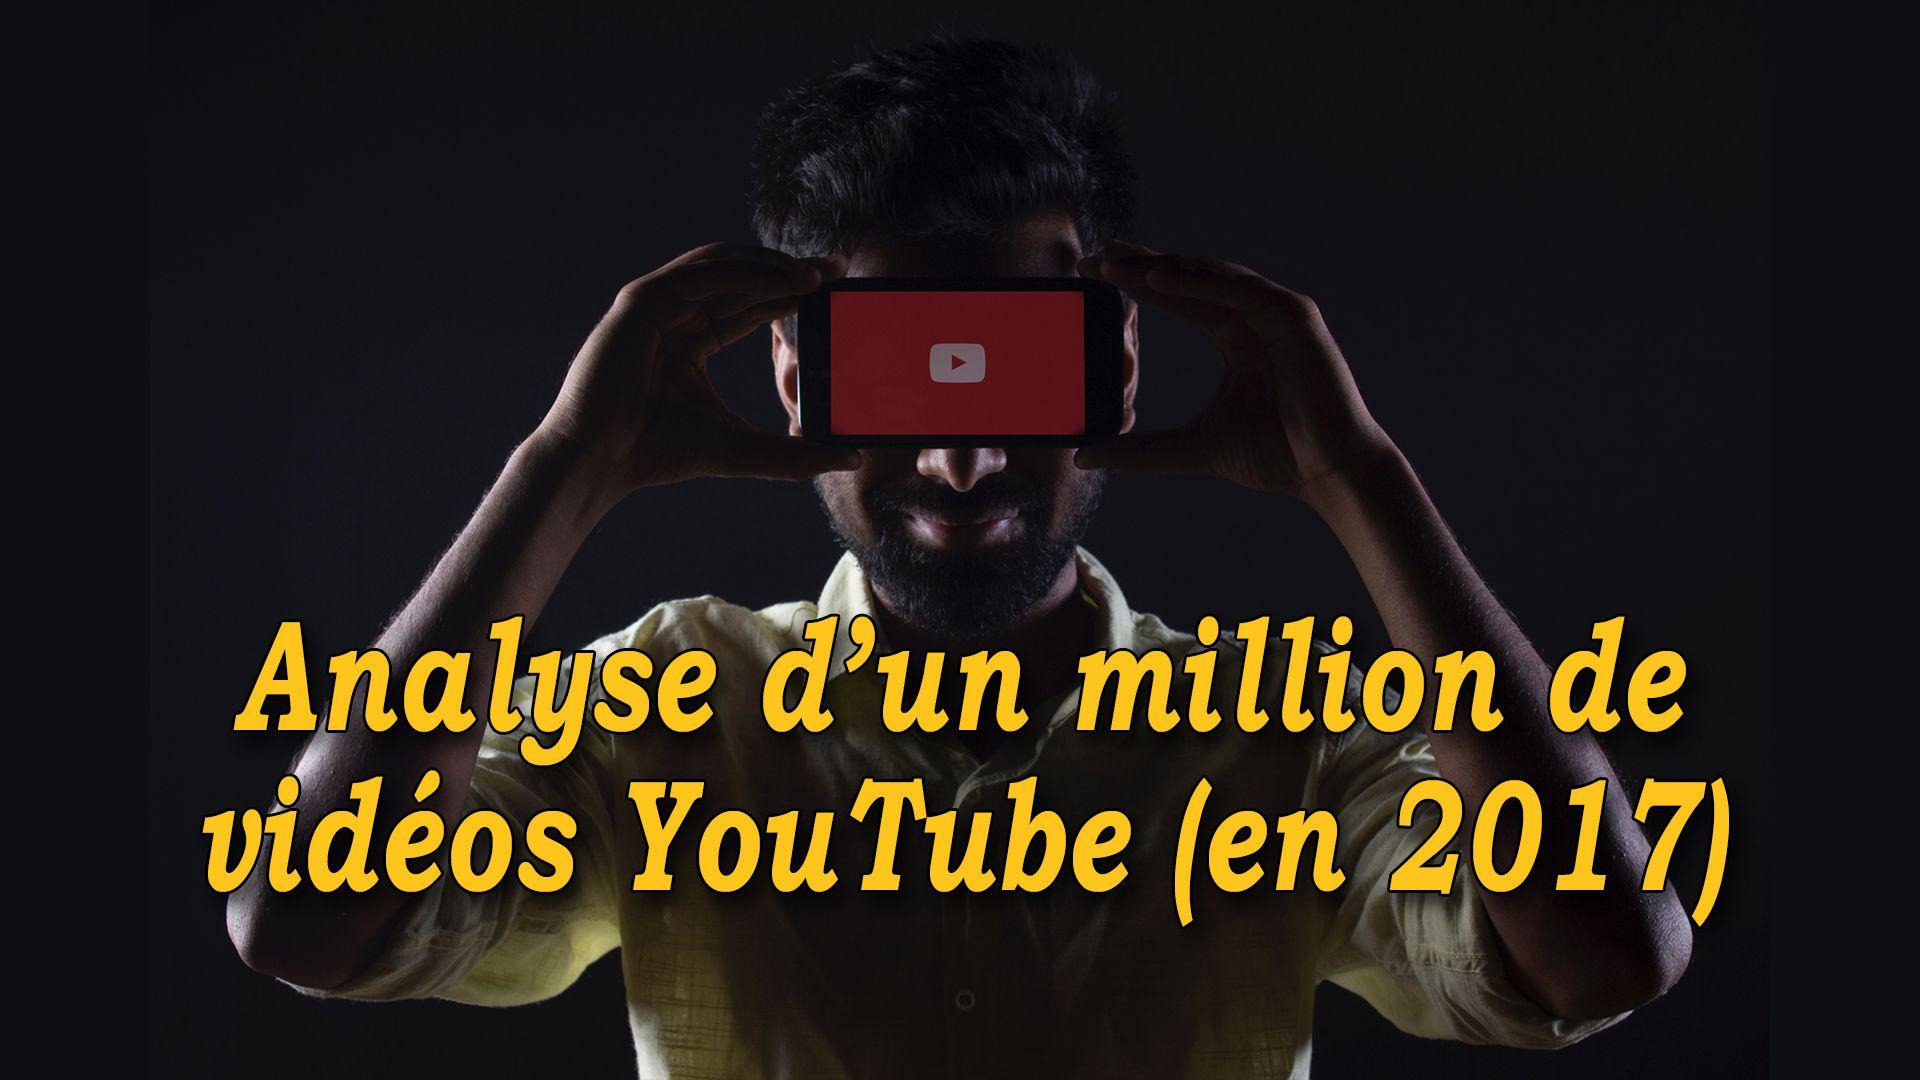 Analyse d'un millions de vidéos YouTube (en 2017) #GrowthHacking #WebMarketing #FormationGrowthHacking #CentreDeFormationFrance #TunnelAARRR #AARRR #SocialMedia #CommunityManagement #SEO #MarketingDigital #SiteWeb #YouTubeSEO #YouTube